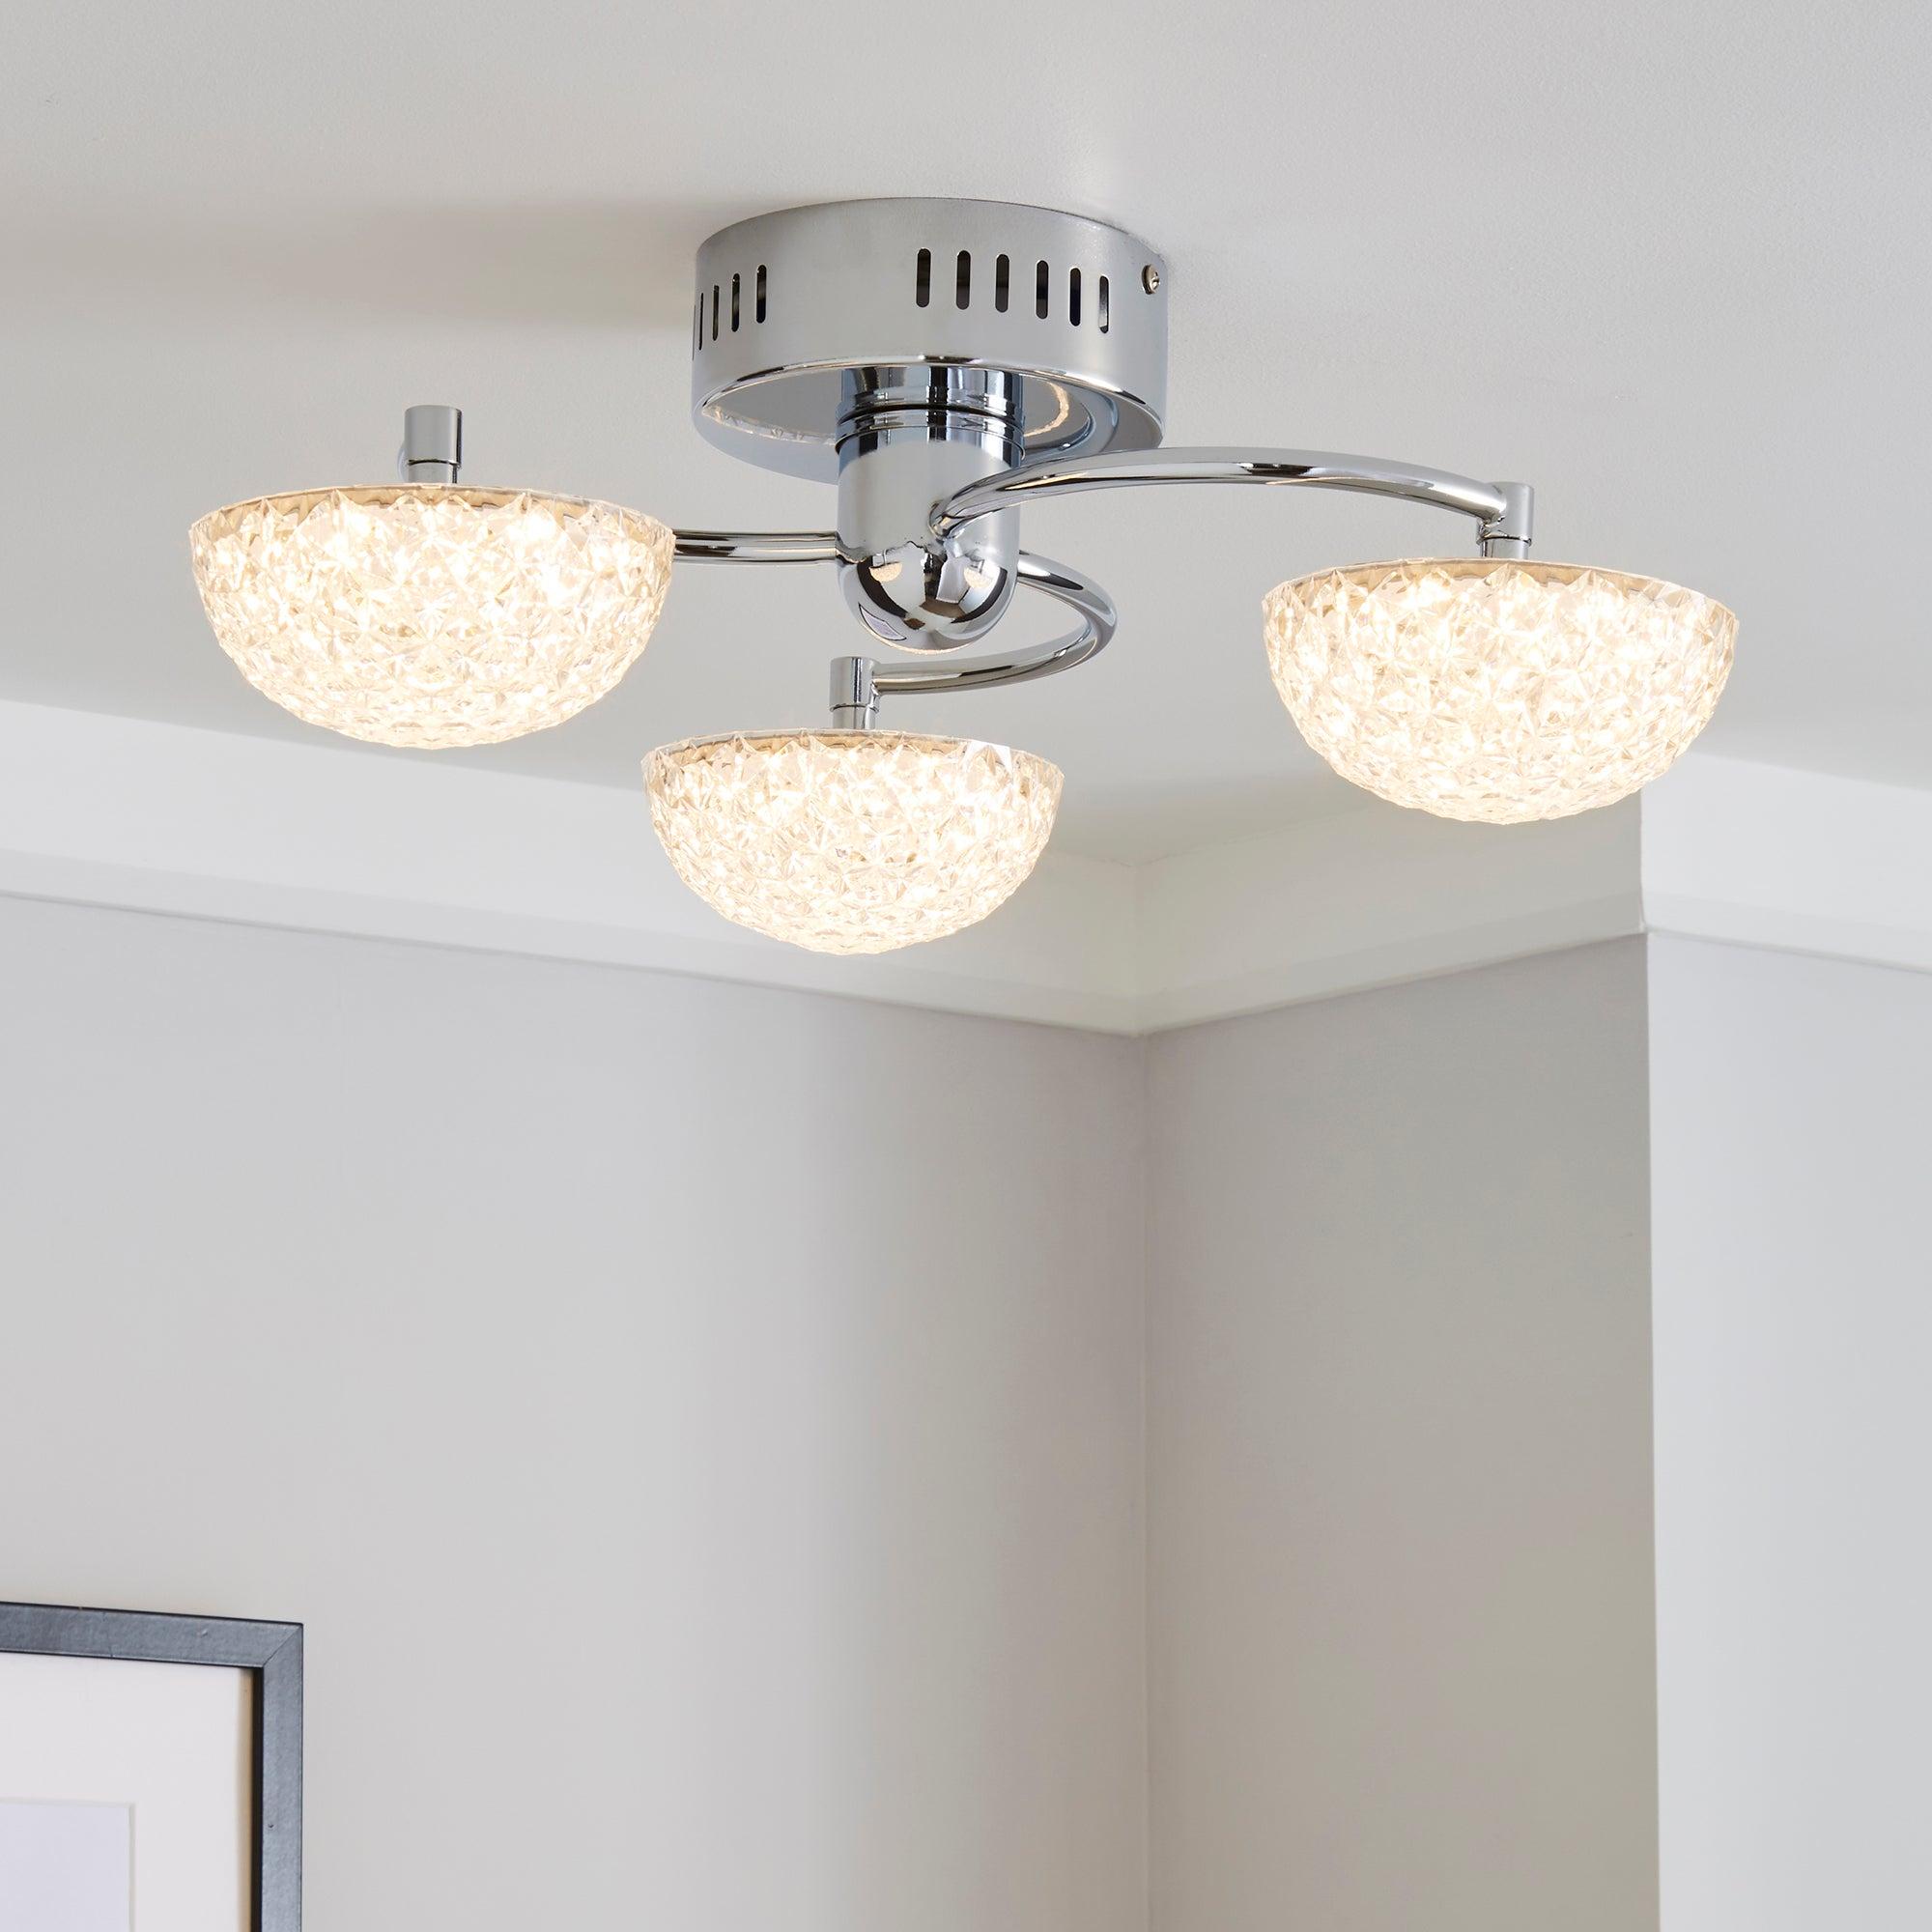 Dunelm Brodie 3 Light LED Chrome Semi-Flush Ceiling Fitting Chrome